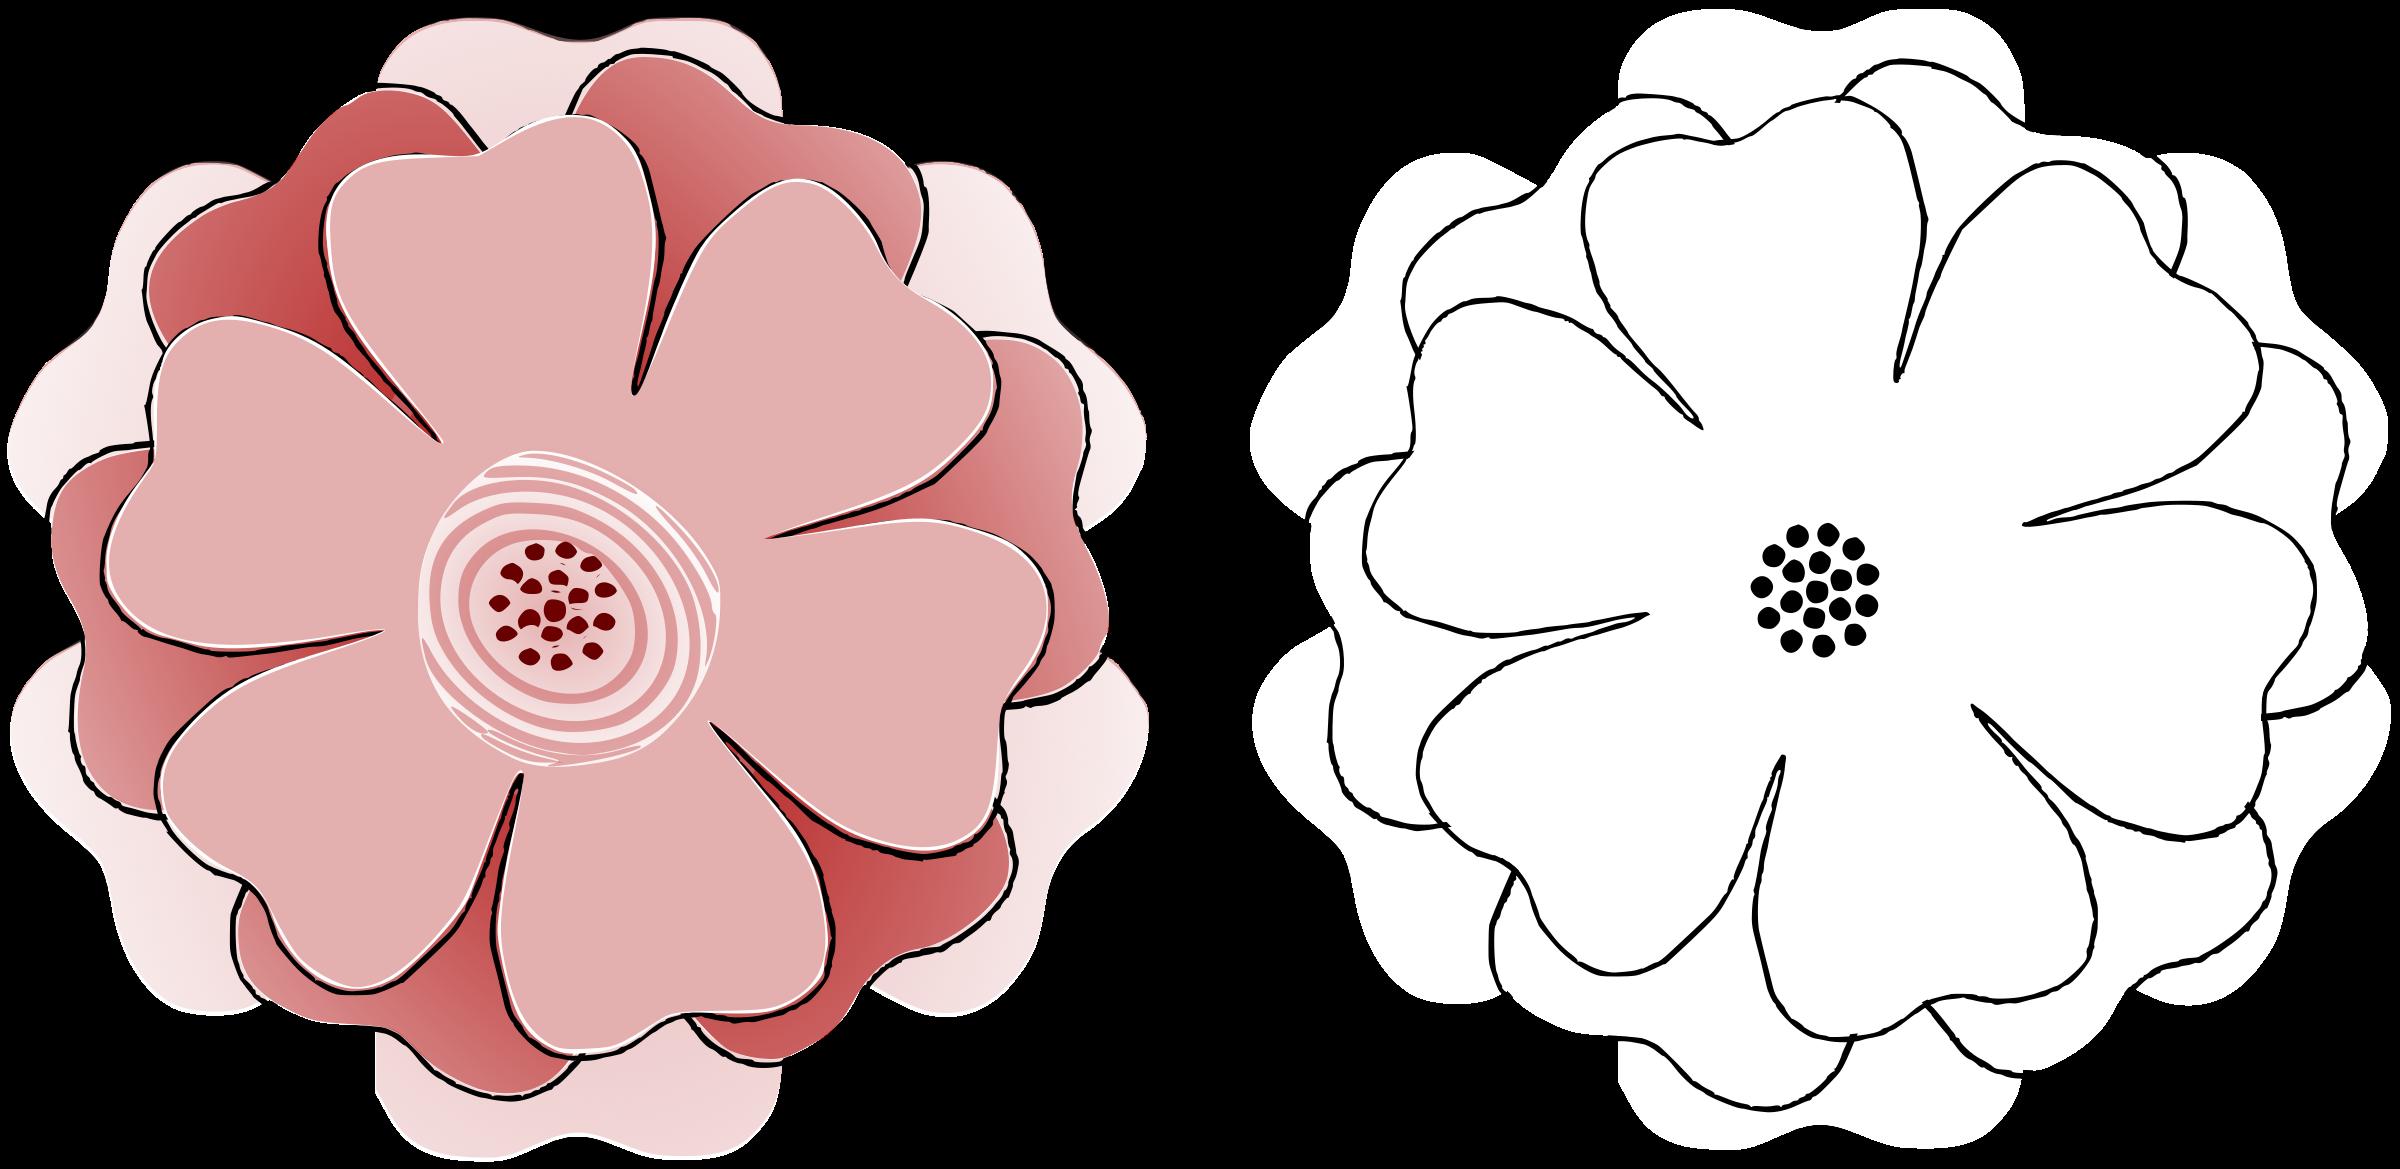 Clipart Flower Multichoice 6 Petal s3 Template – Flower Petal Template